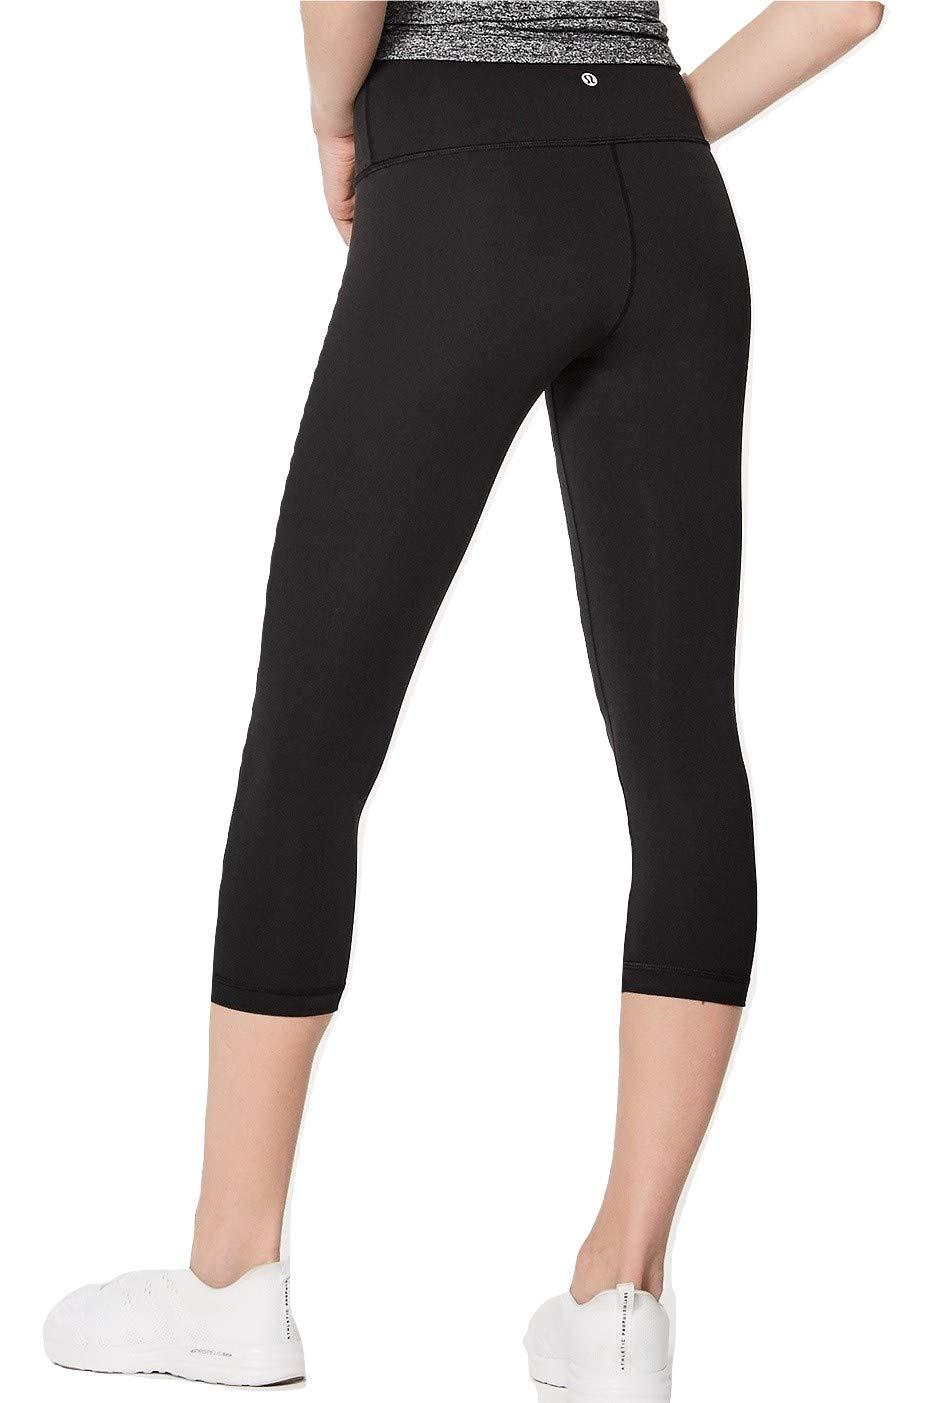 Lululemon Wunder Under Crop High Rise Luxtreme Yoga Pants (Black, 2)